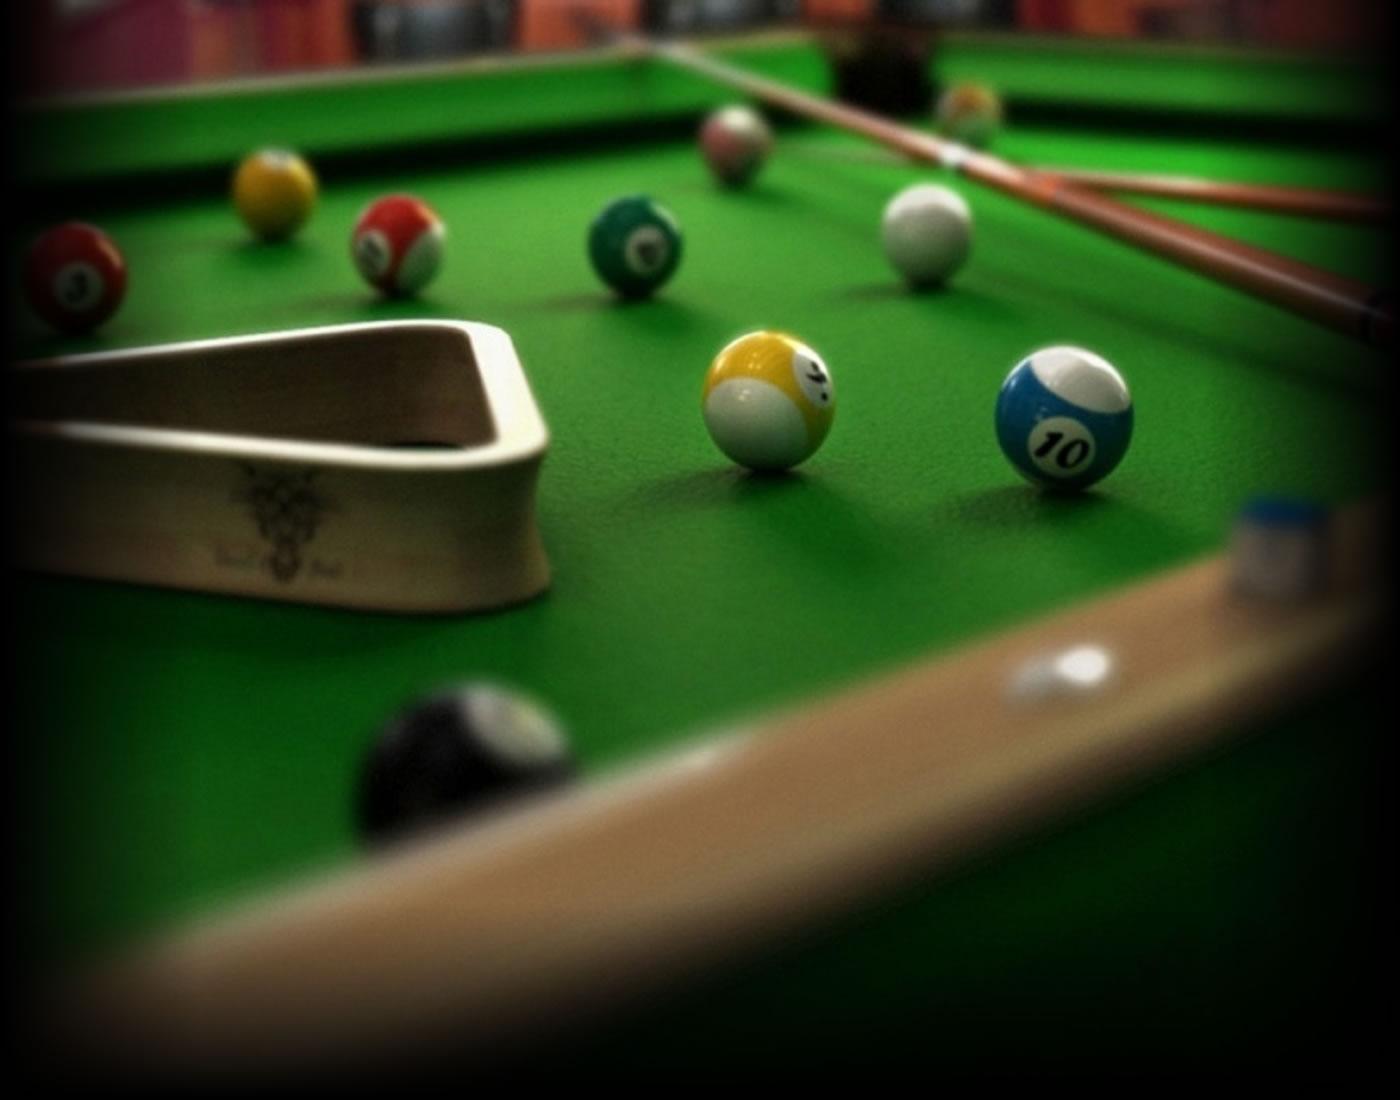 BUCKS BILLIARDS - Nearest bar with pool table